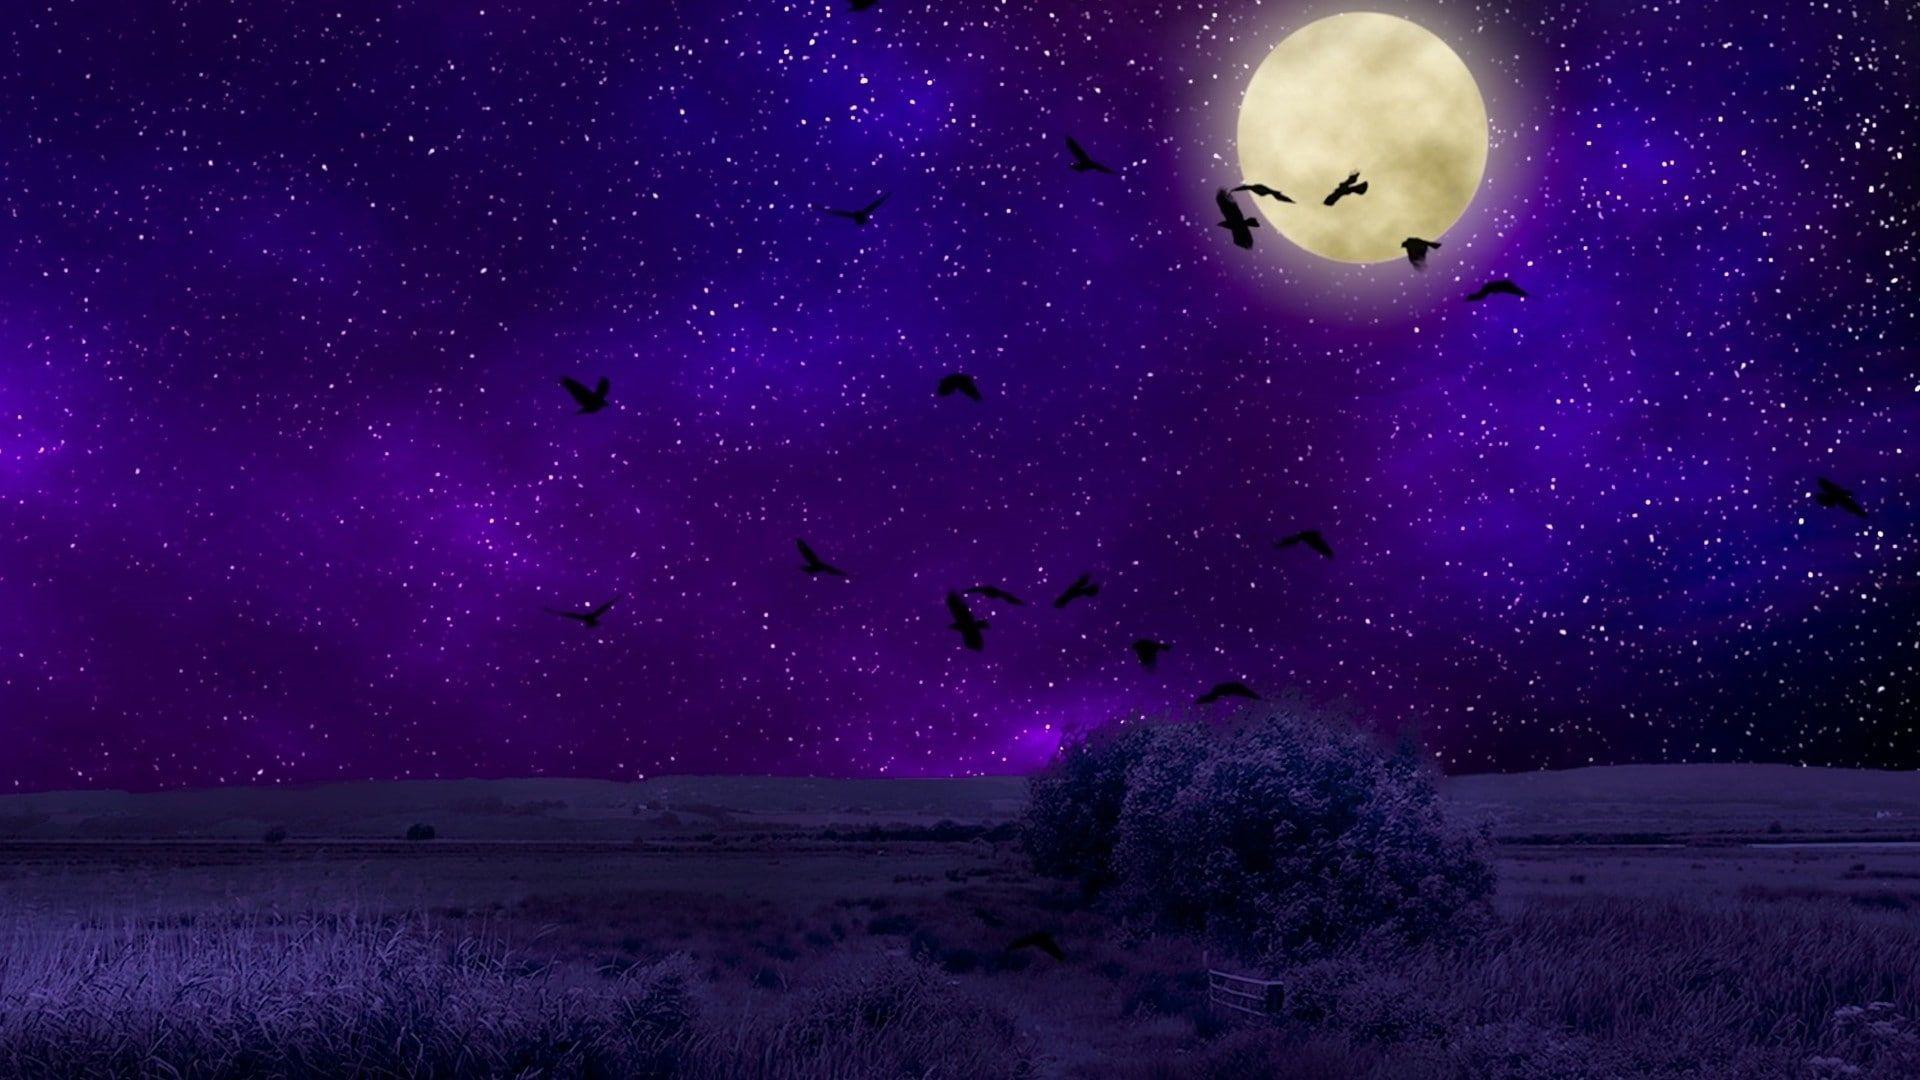 Sky Purple Night Sky Starry Night Field Night Full Moon Birds Moon Darkness Space Moonlight Stars 1080p Wa In 2021 Starry Night Hd Wallpaper Field Wallpaper 1080p night sky moon wallpaper hd